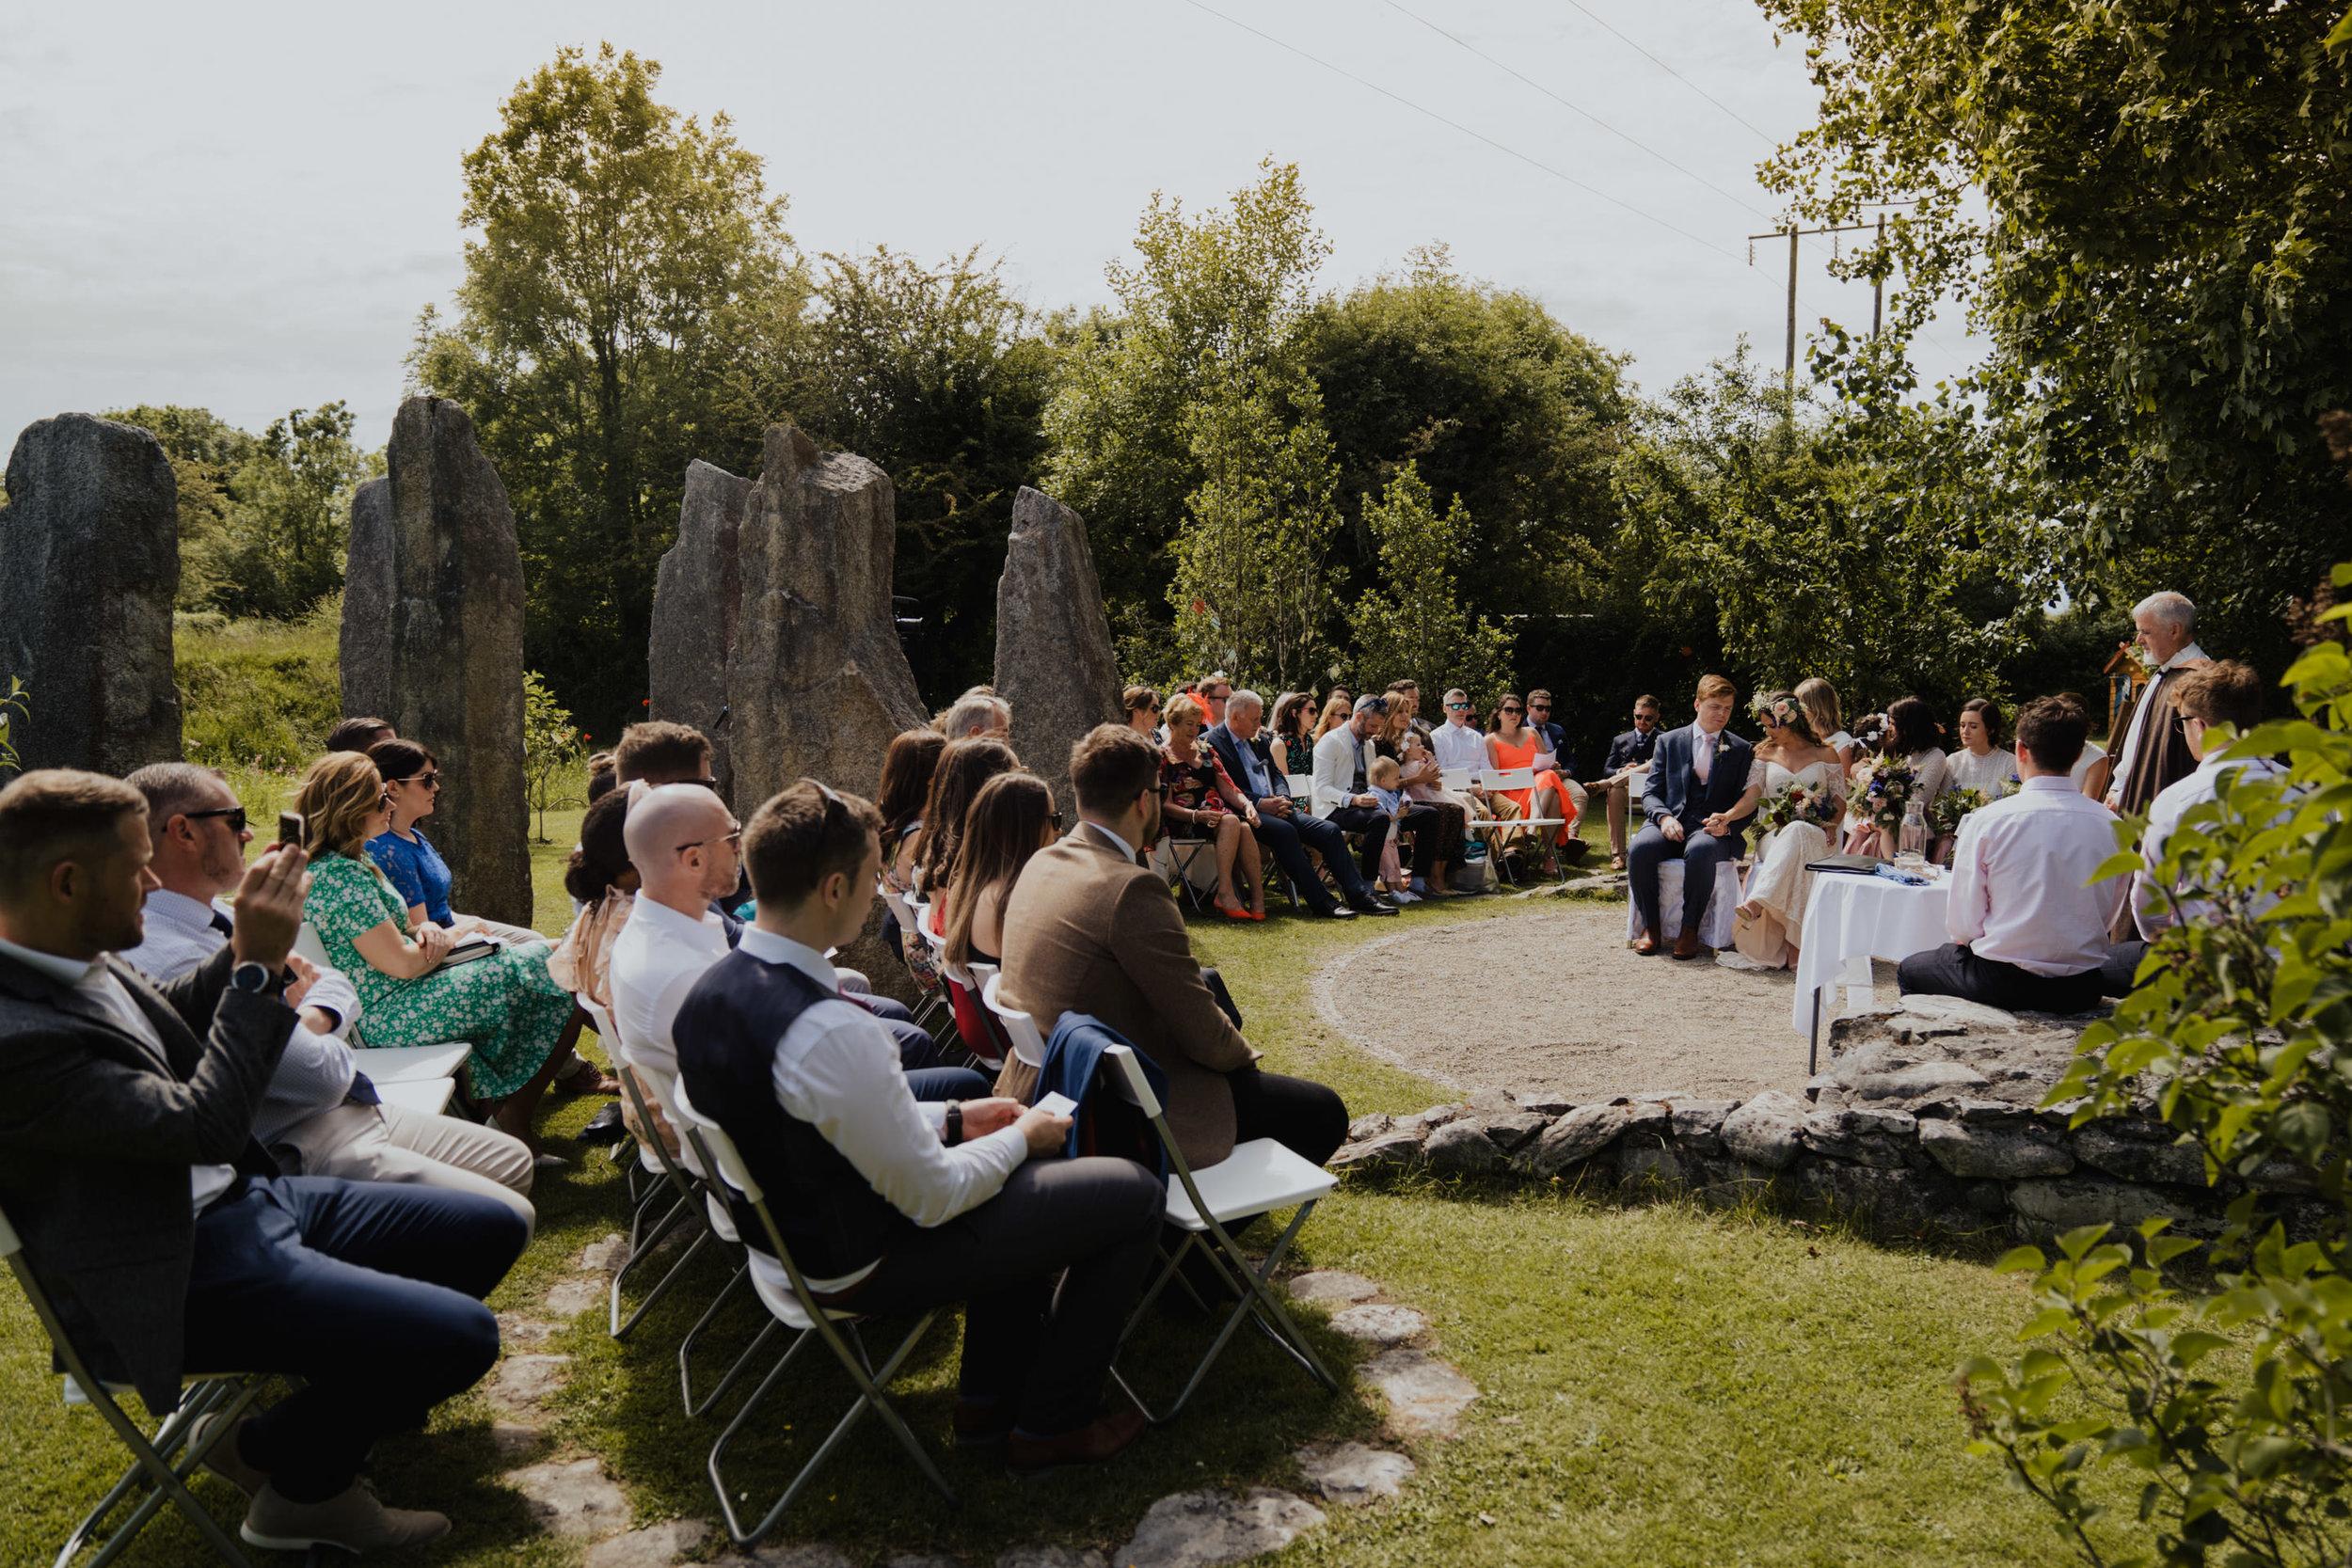 c&j_brigits_garden_galway_wedding_photographer_livia_figueiredo_24.jpg